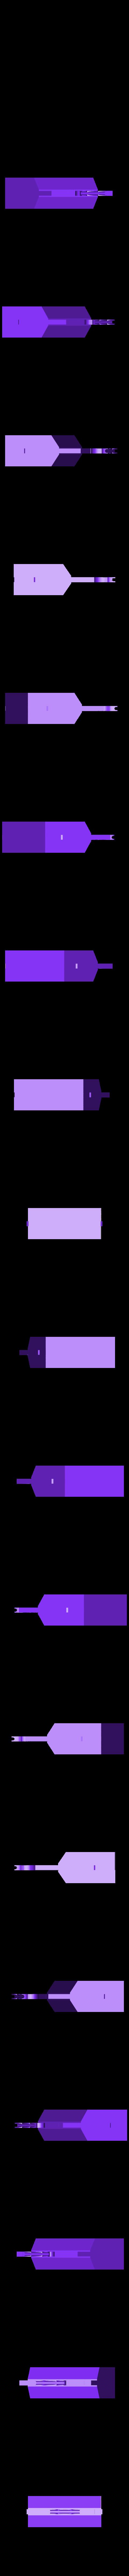 curedent_base.STL Download STL file Magic toothpick dispenser • Object to 3D print, ffmicka